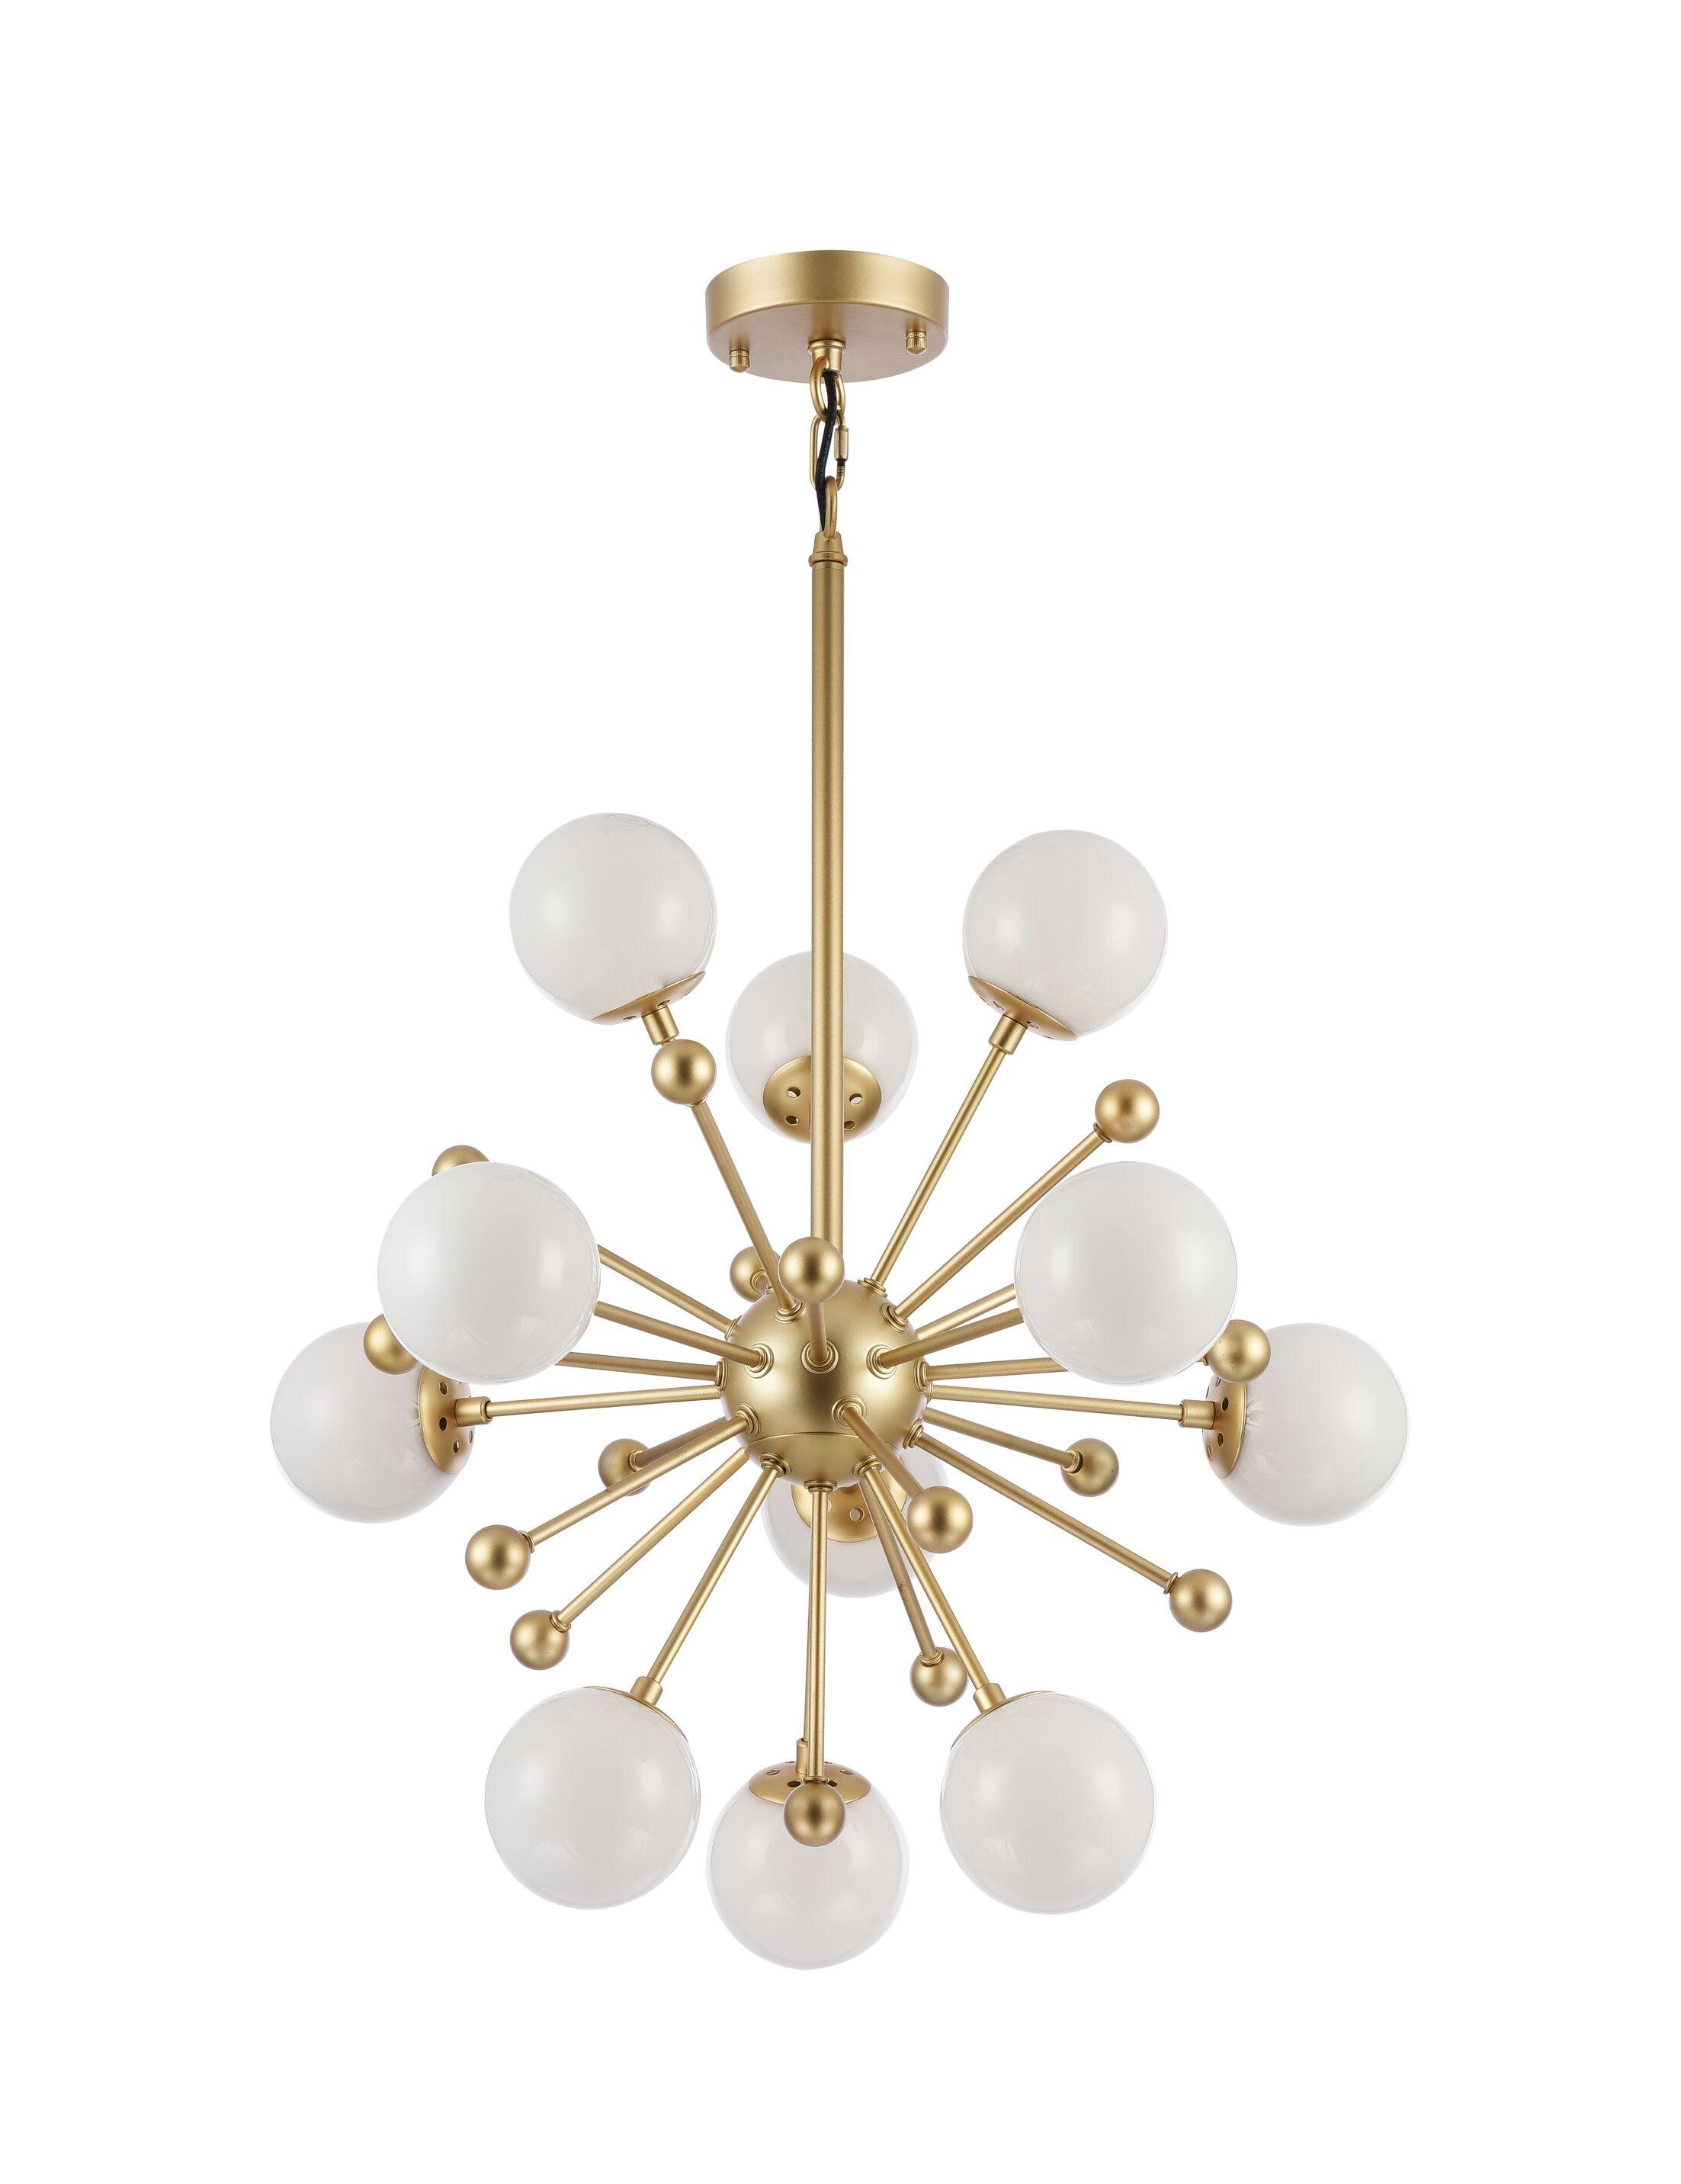 Cosme 11-Light Sputnik Chandelier